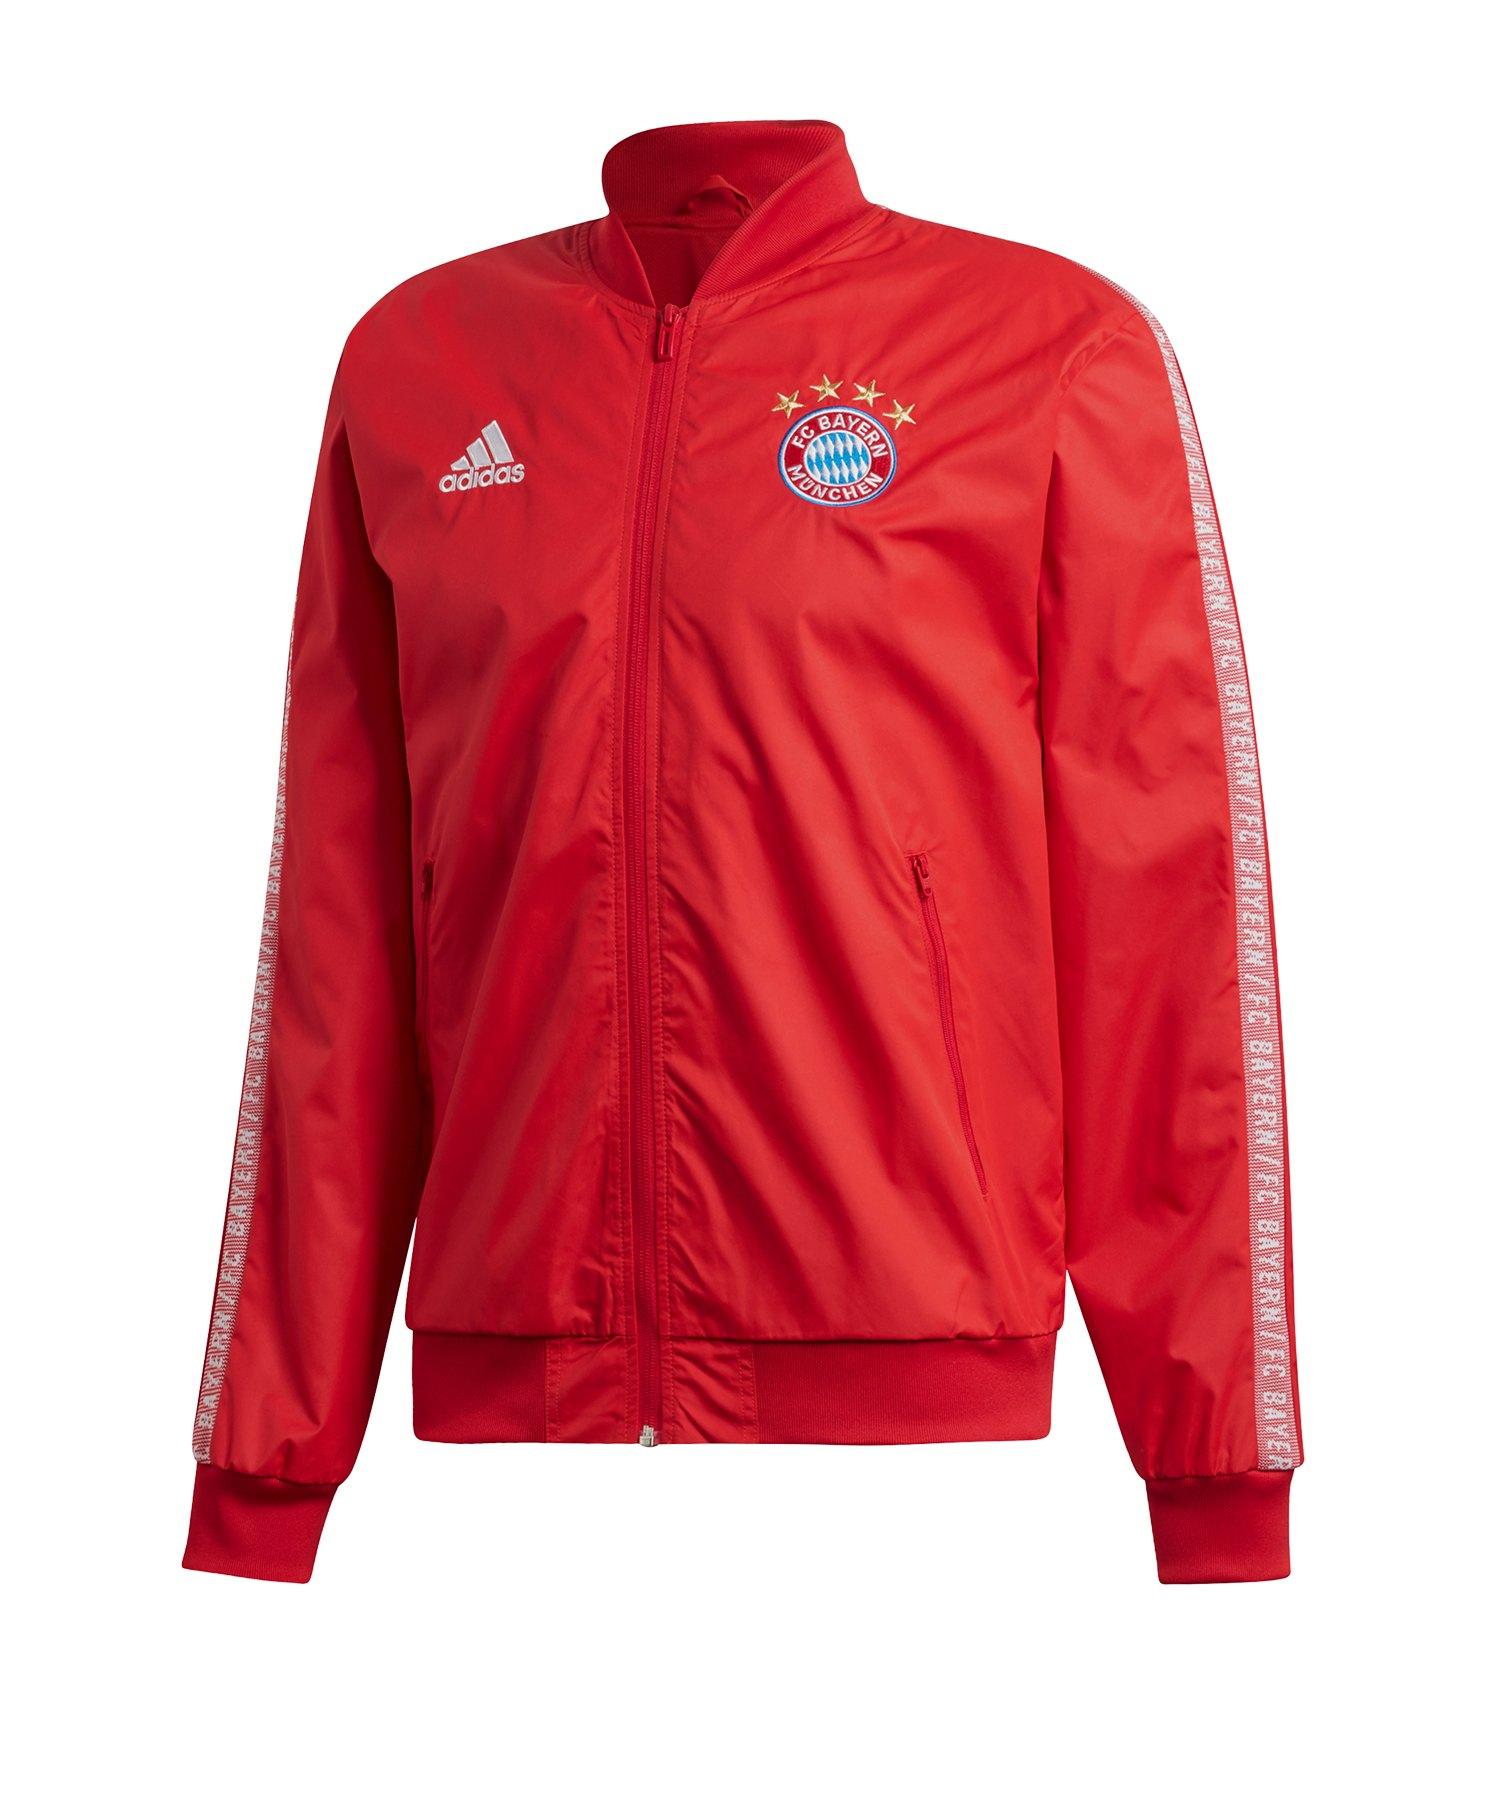 adidas FC Bayern München Anthem Jacket Jacke Rot - Rot